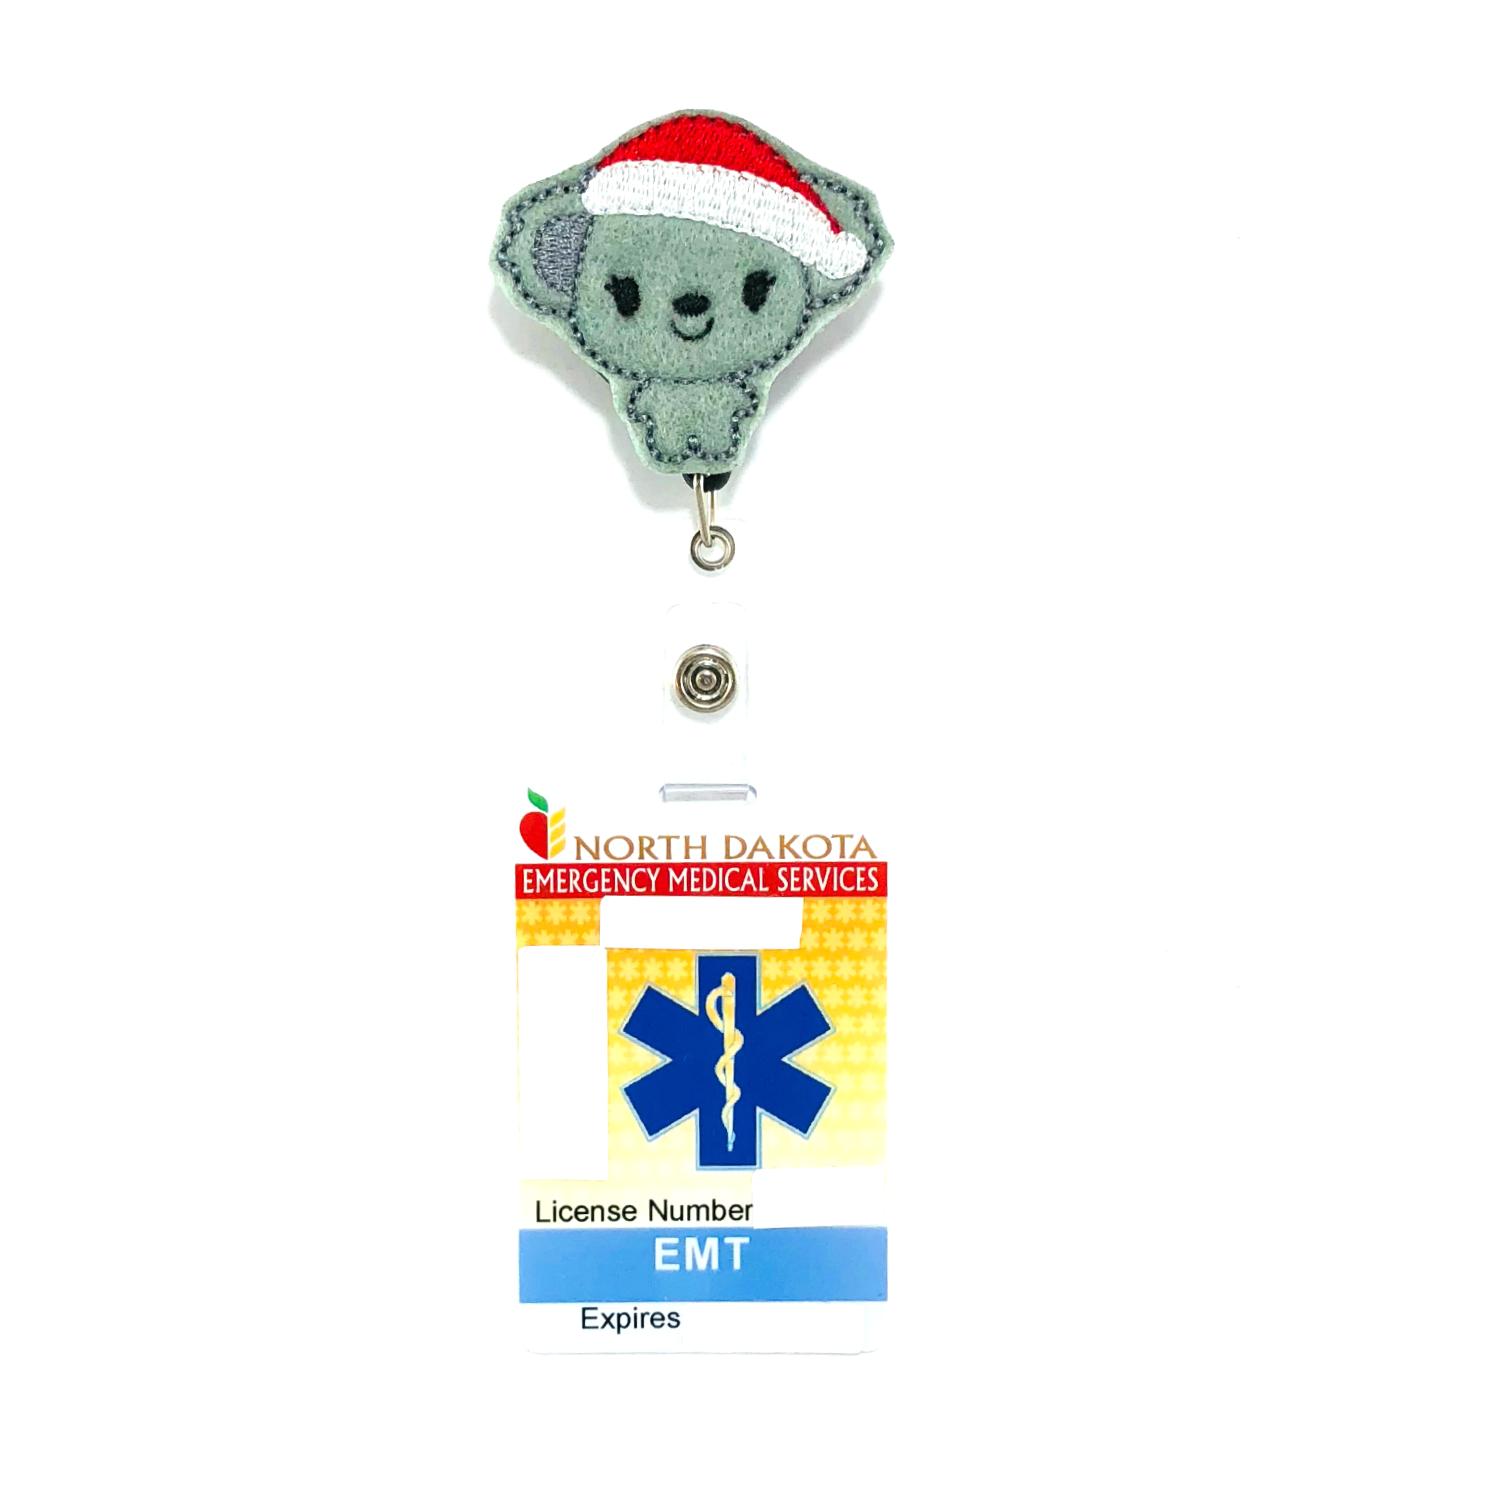 Christmas Koala Bear Badge Reel Holder Clip Santa Name Tag ID Charm Accessory